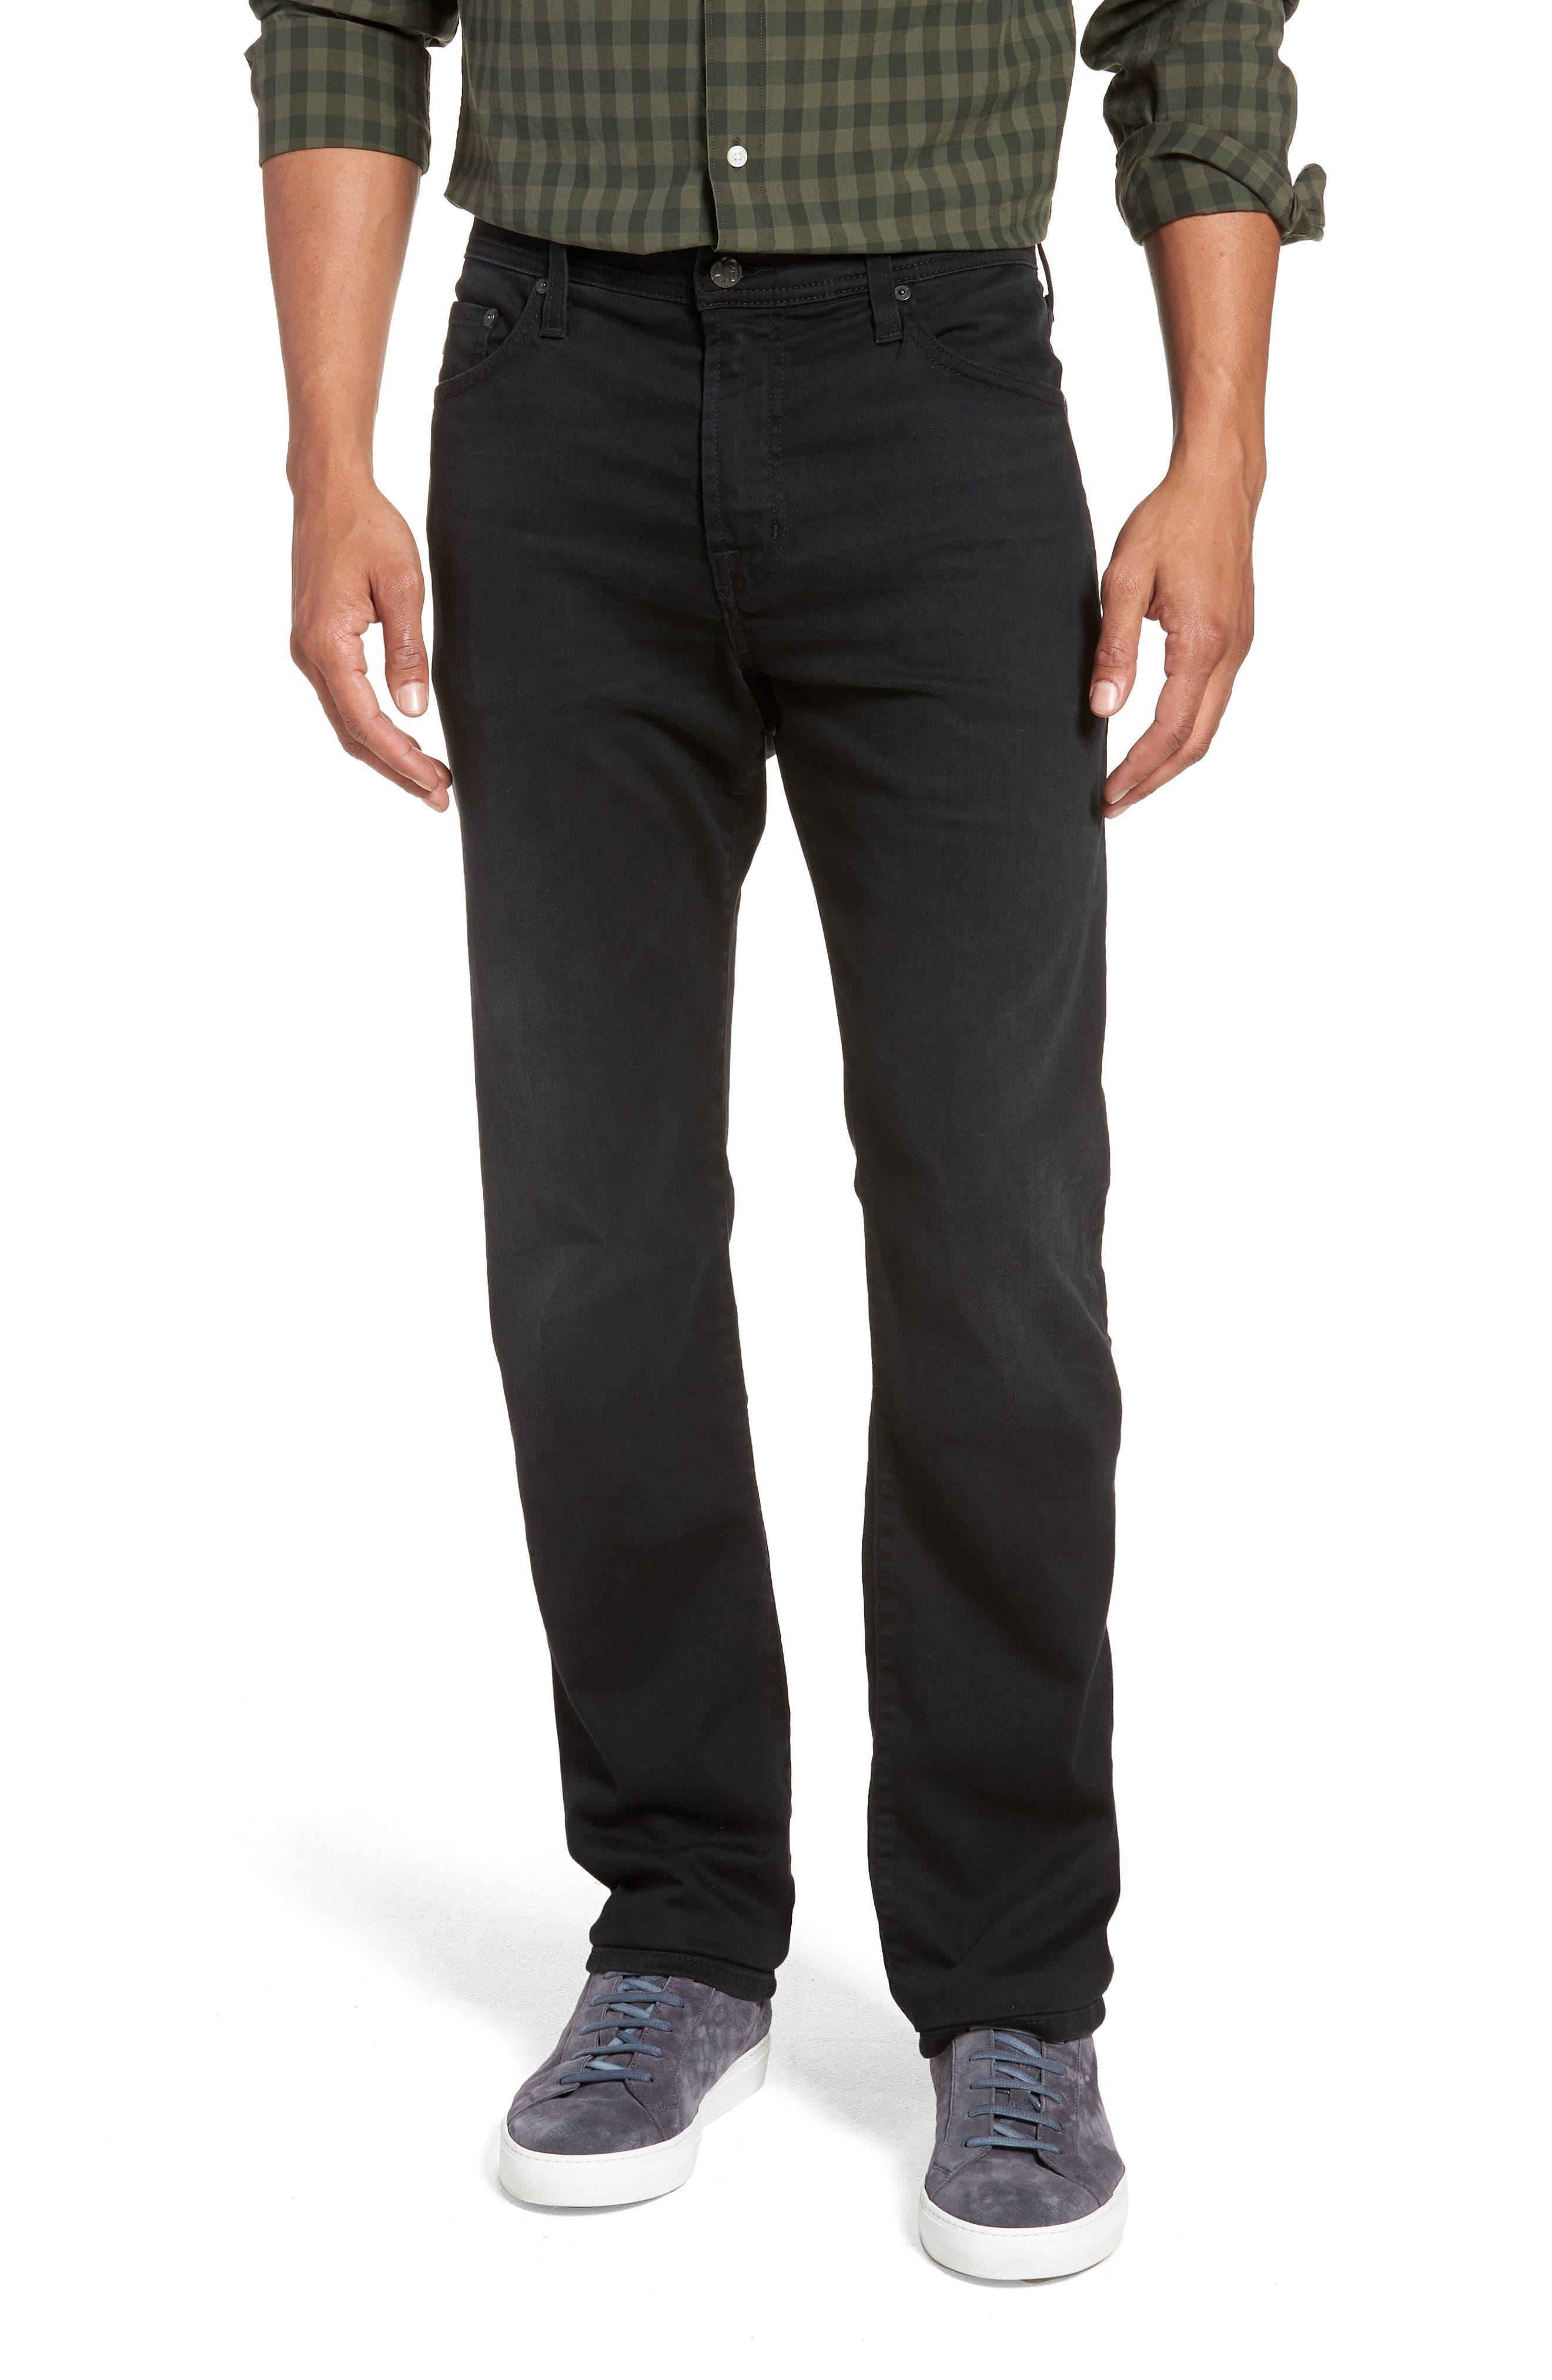 Everett Slim Straight Leg Jeans,                         Main,                         color, 001